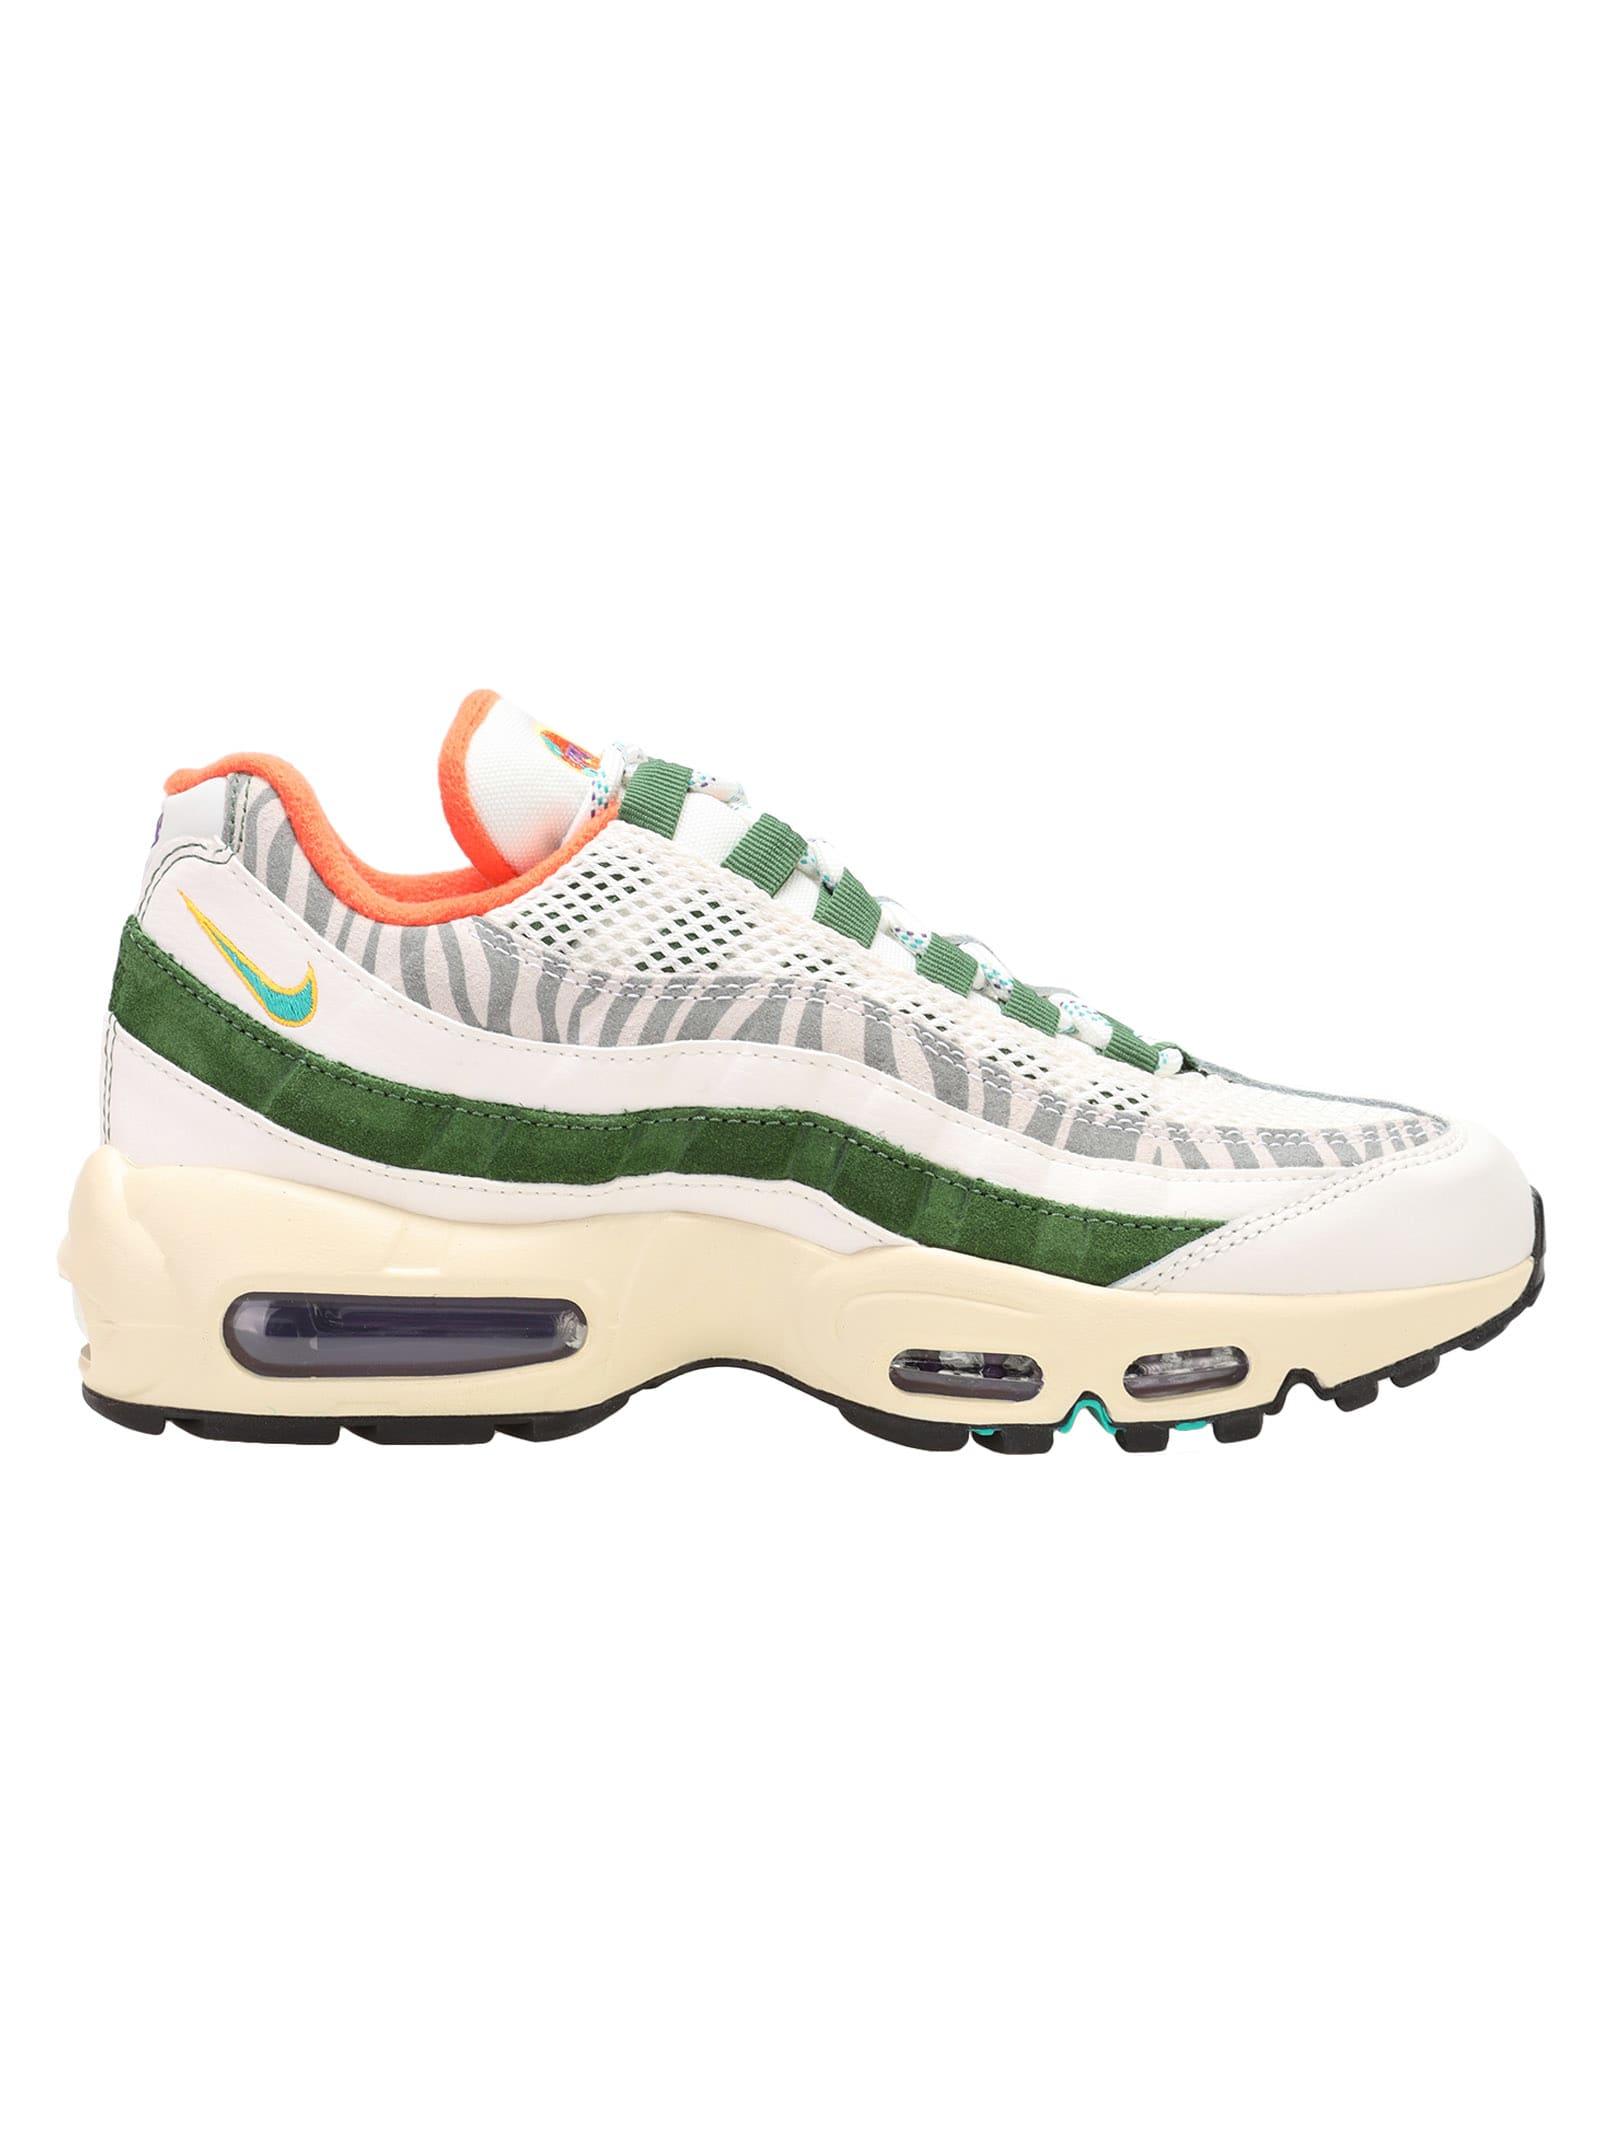 Nike Ltd Air Max 95 Era